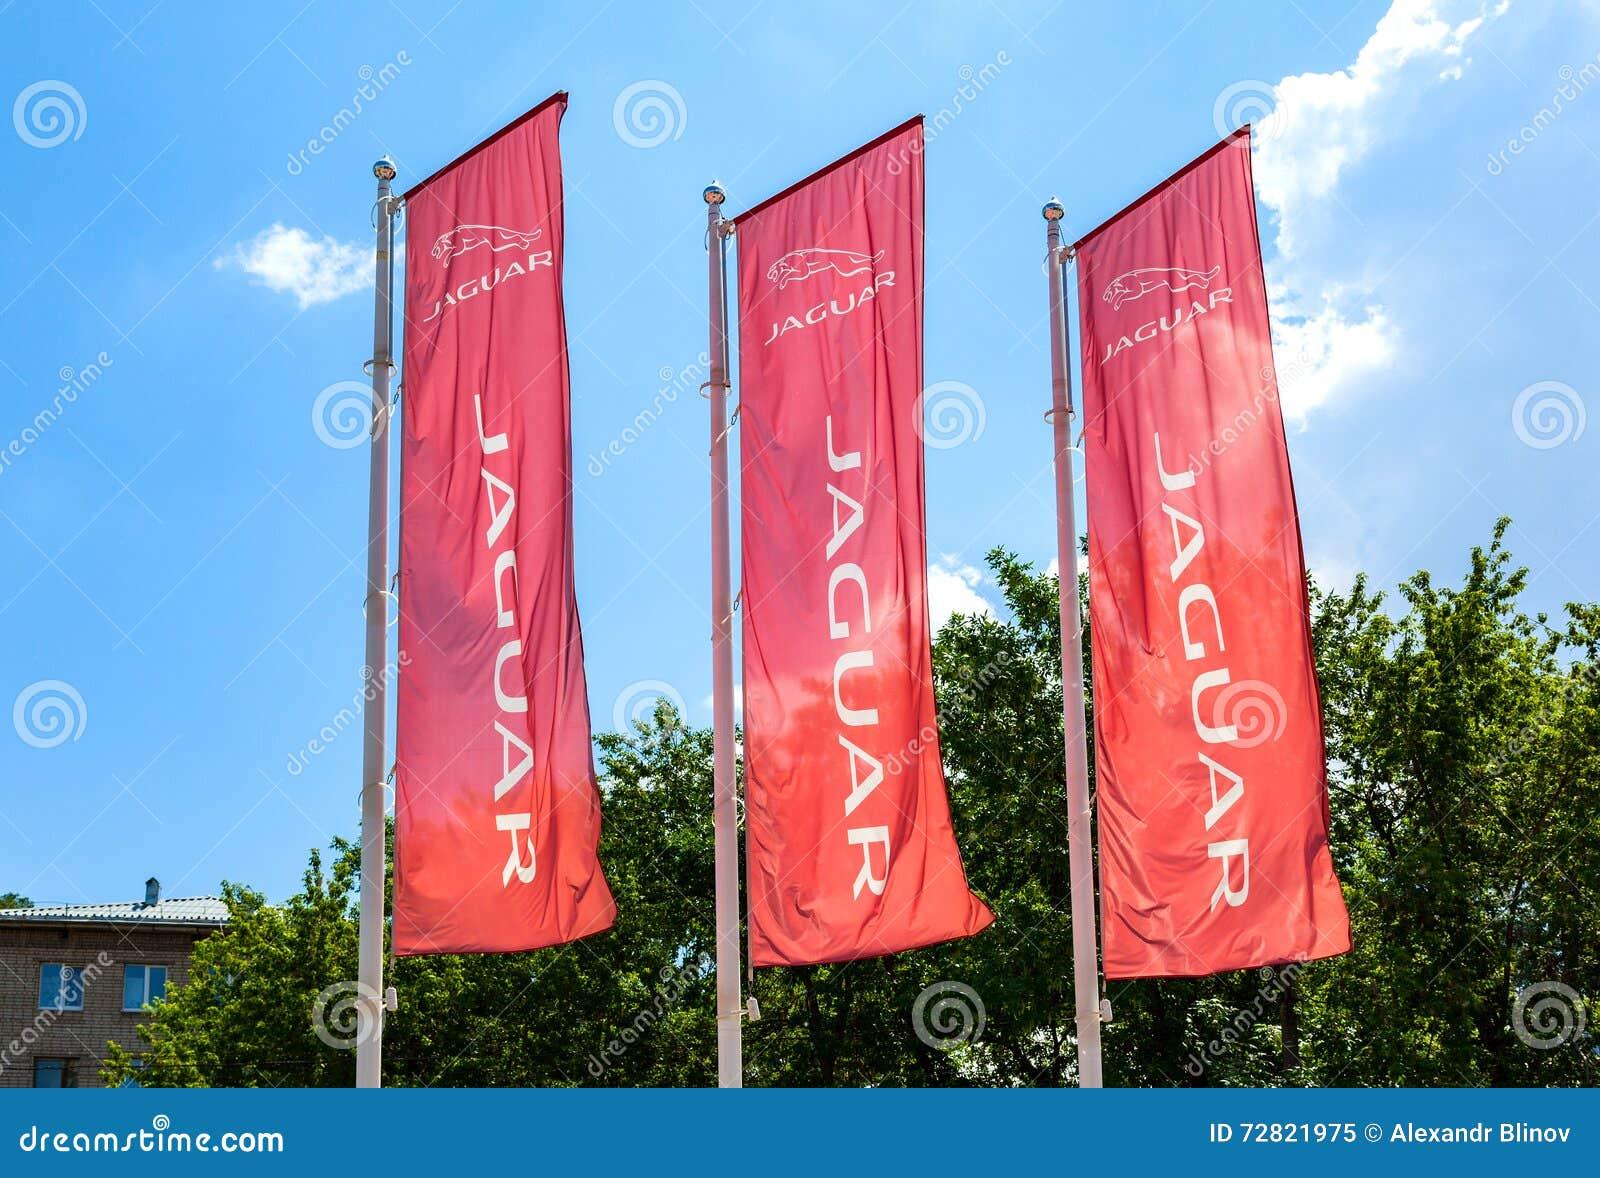 Official Dealership Flags Of Jaguar Against The Blue Sky Backgro